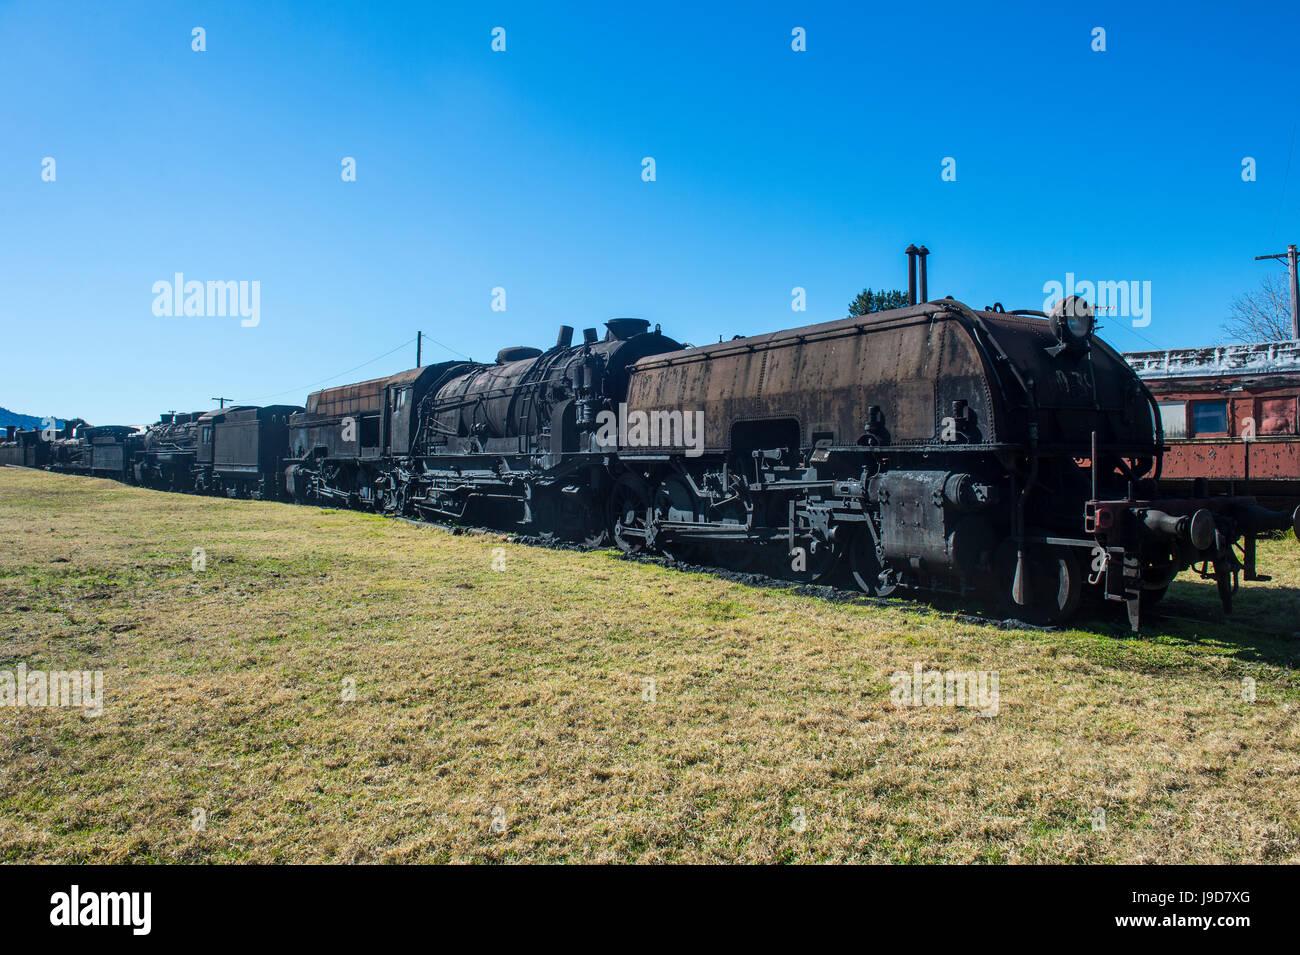 Old steam trains from the Dorrigo railway line, Dorrigo National Park, New South Wales, Australia, Pacific - Stock Image